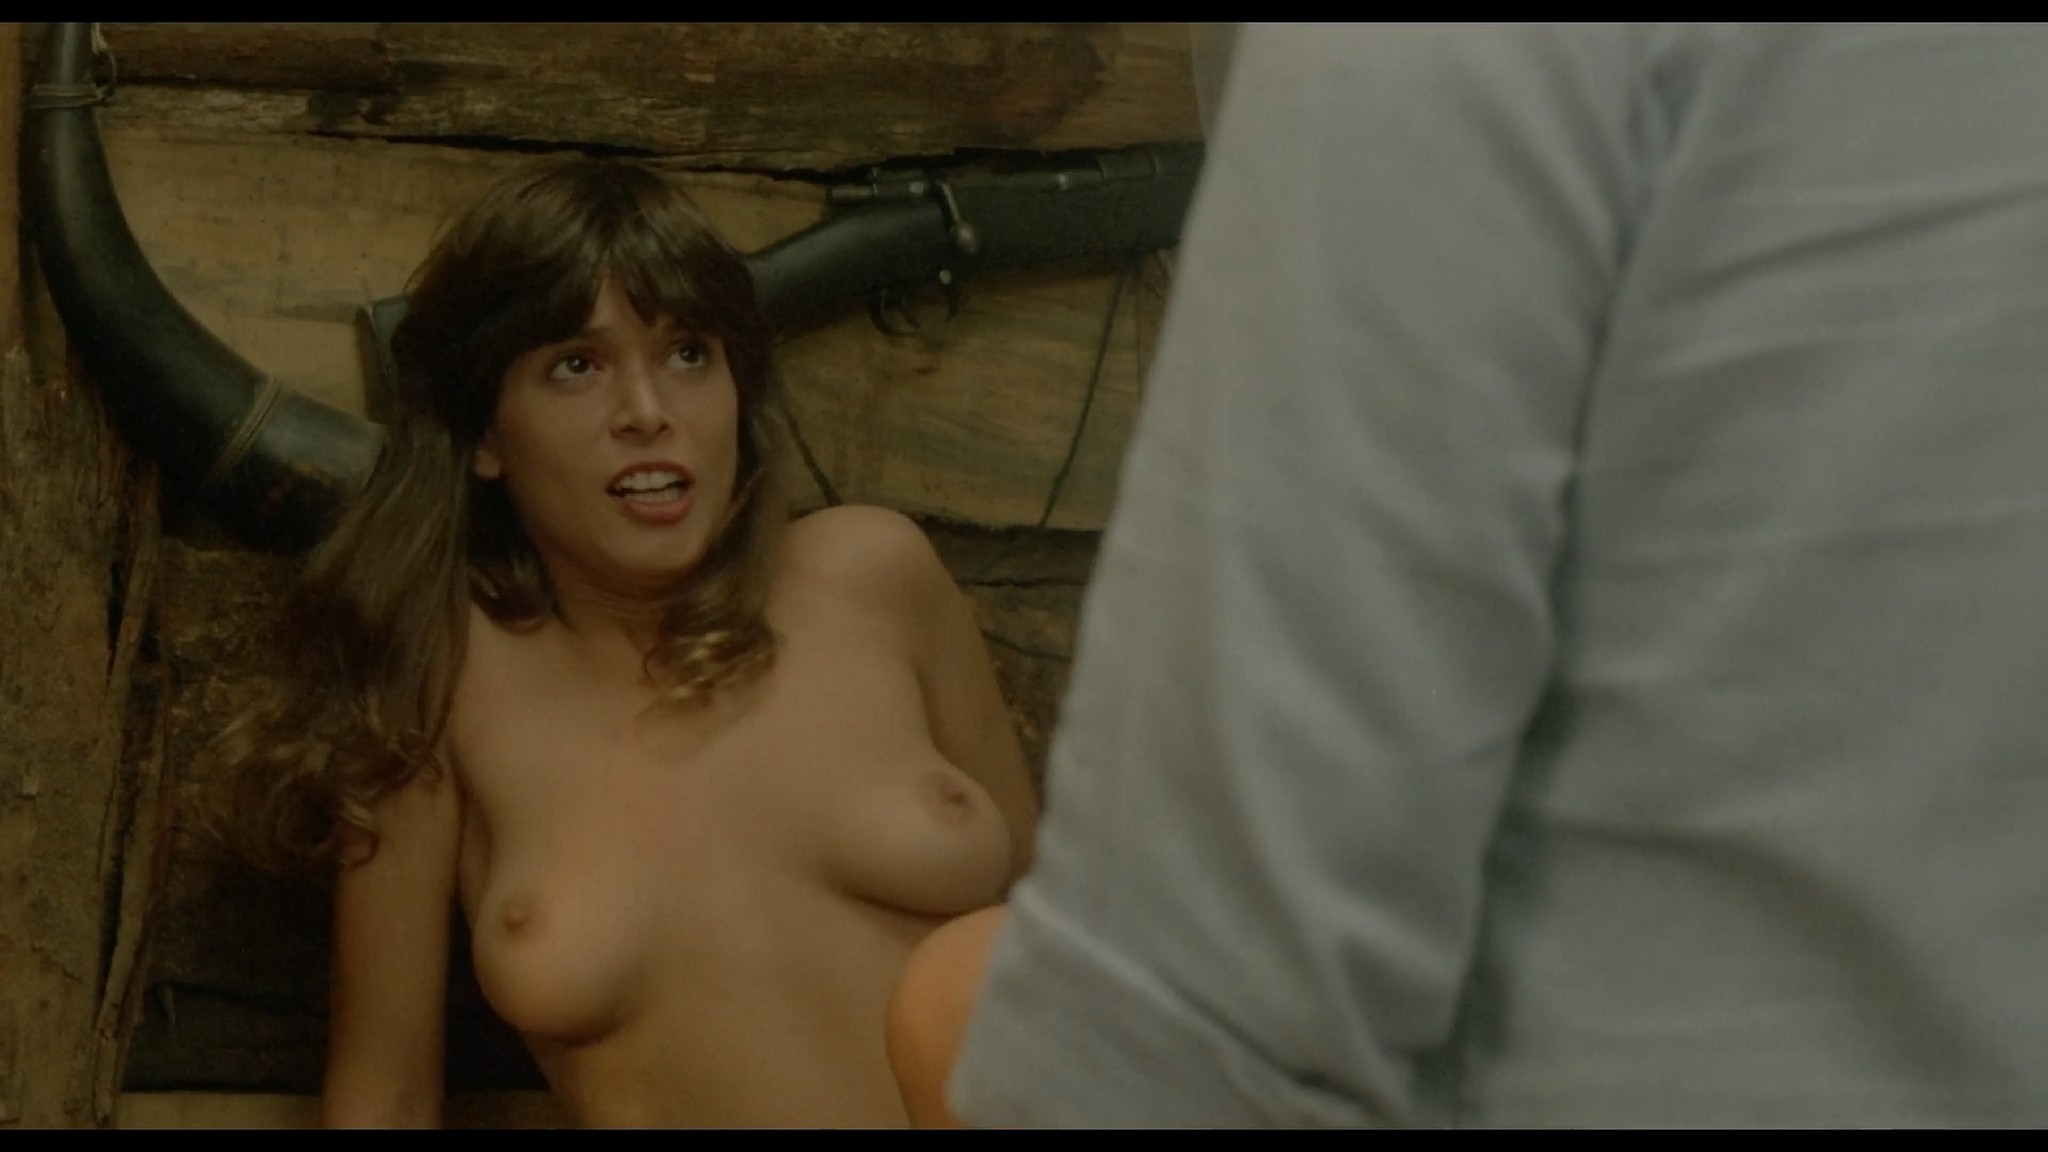 Suzane Carvalho nude bush Susan Hahn nude too Massacre in Dinosaur Valley BR 1985 HD 1080p BluRay REMUX 18